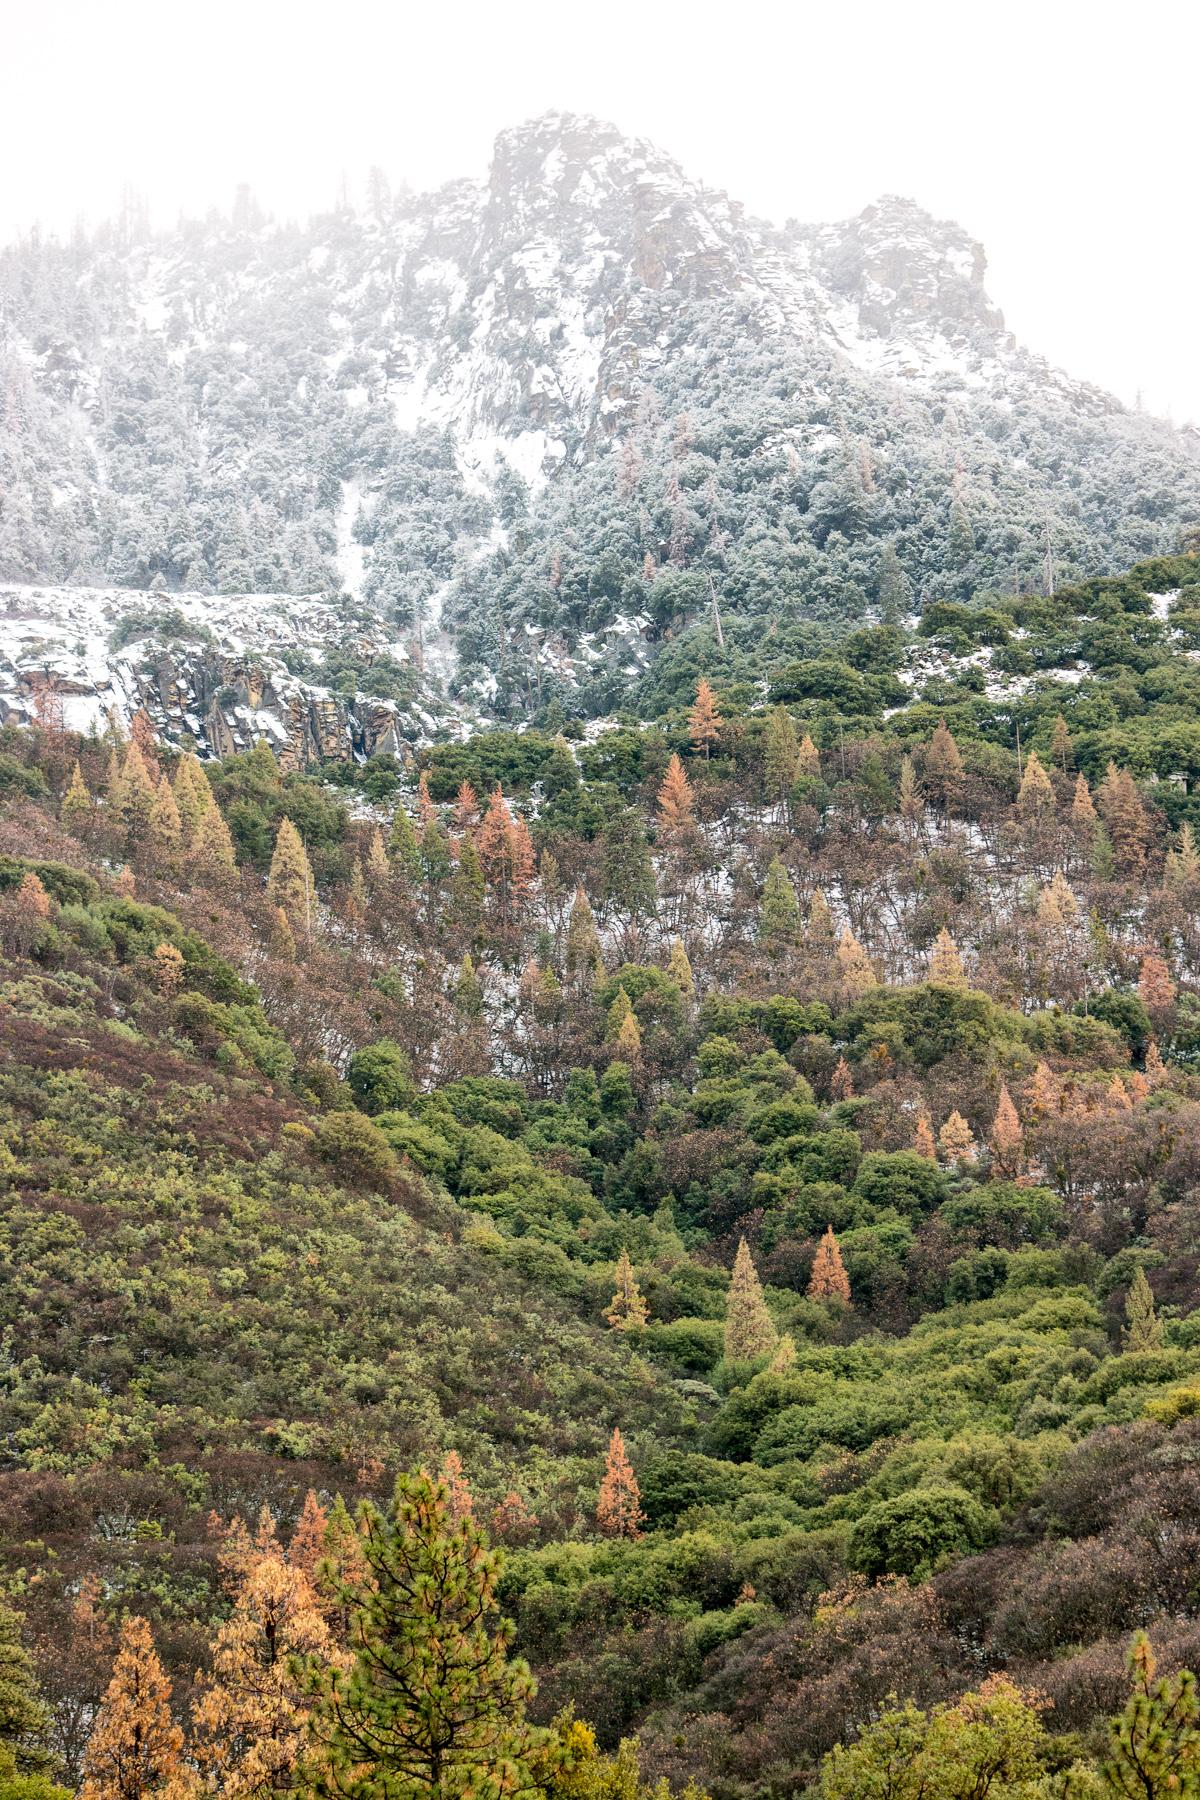 Wasim Muklashy Photography_Sequoia National Park_California_December 2015_-SAM_4281-Edit.jpg